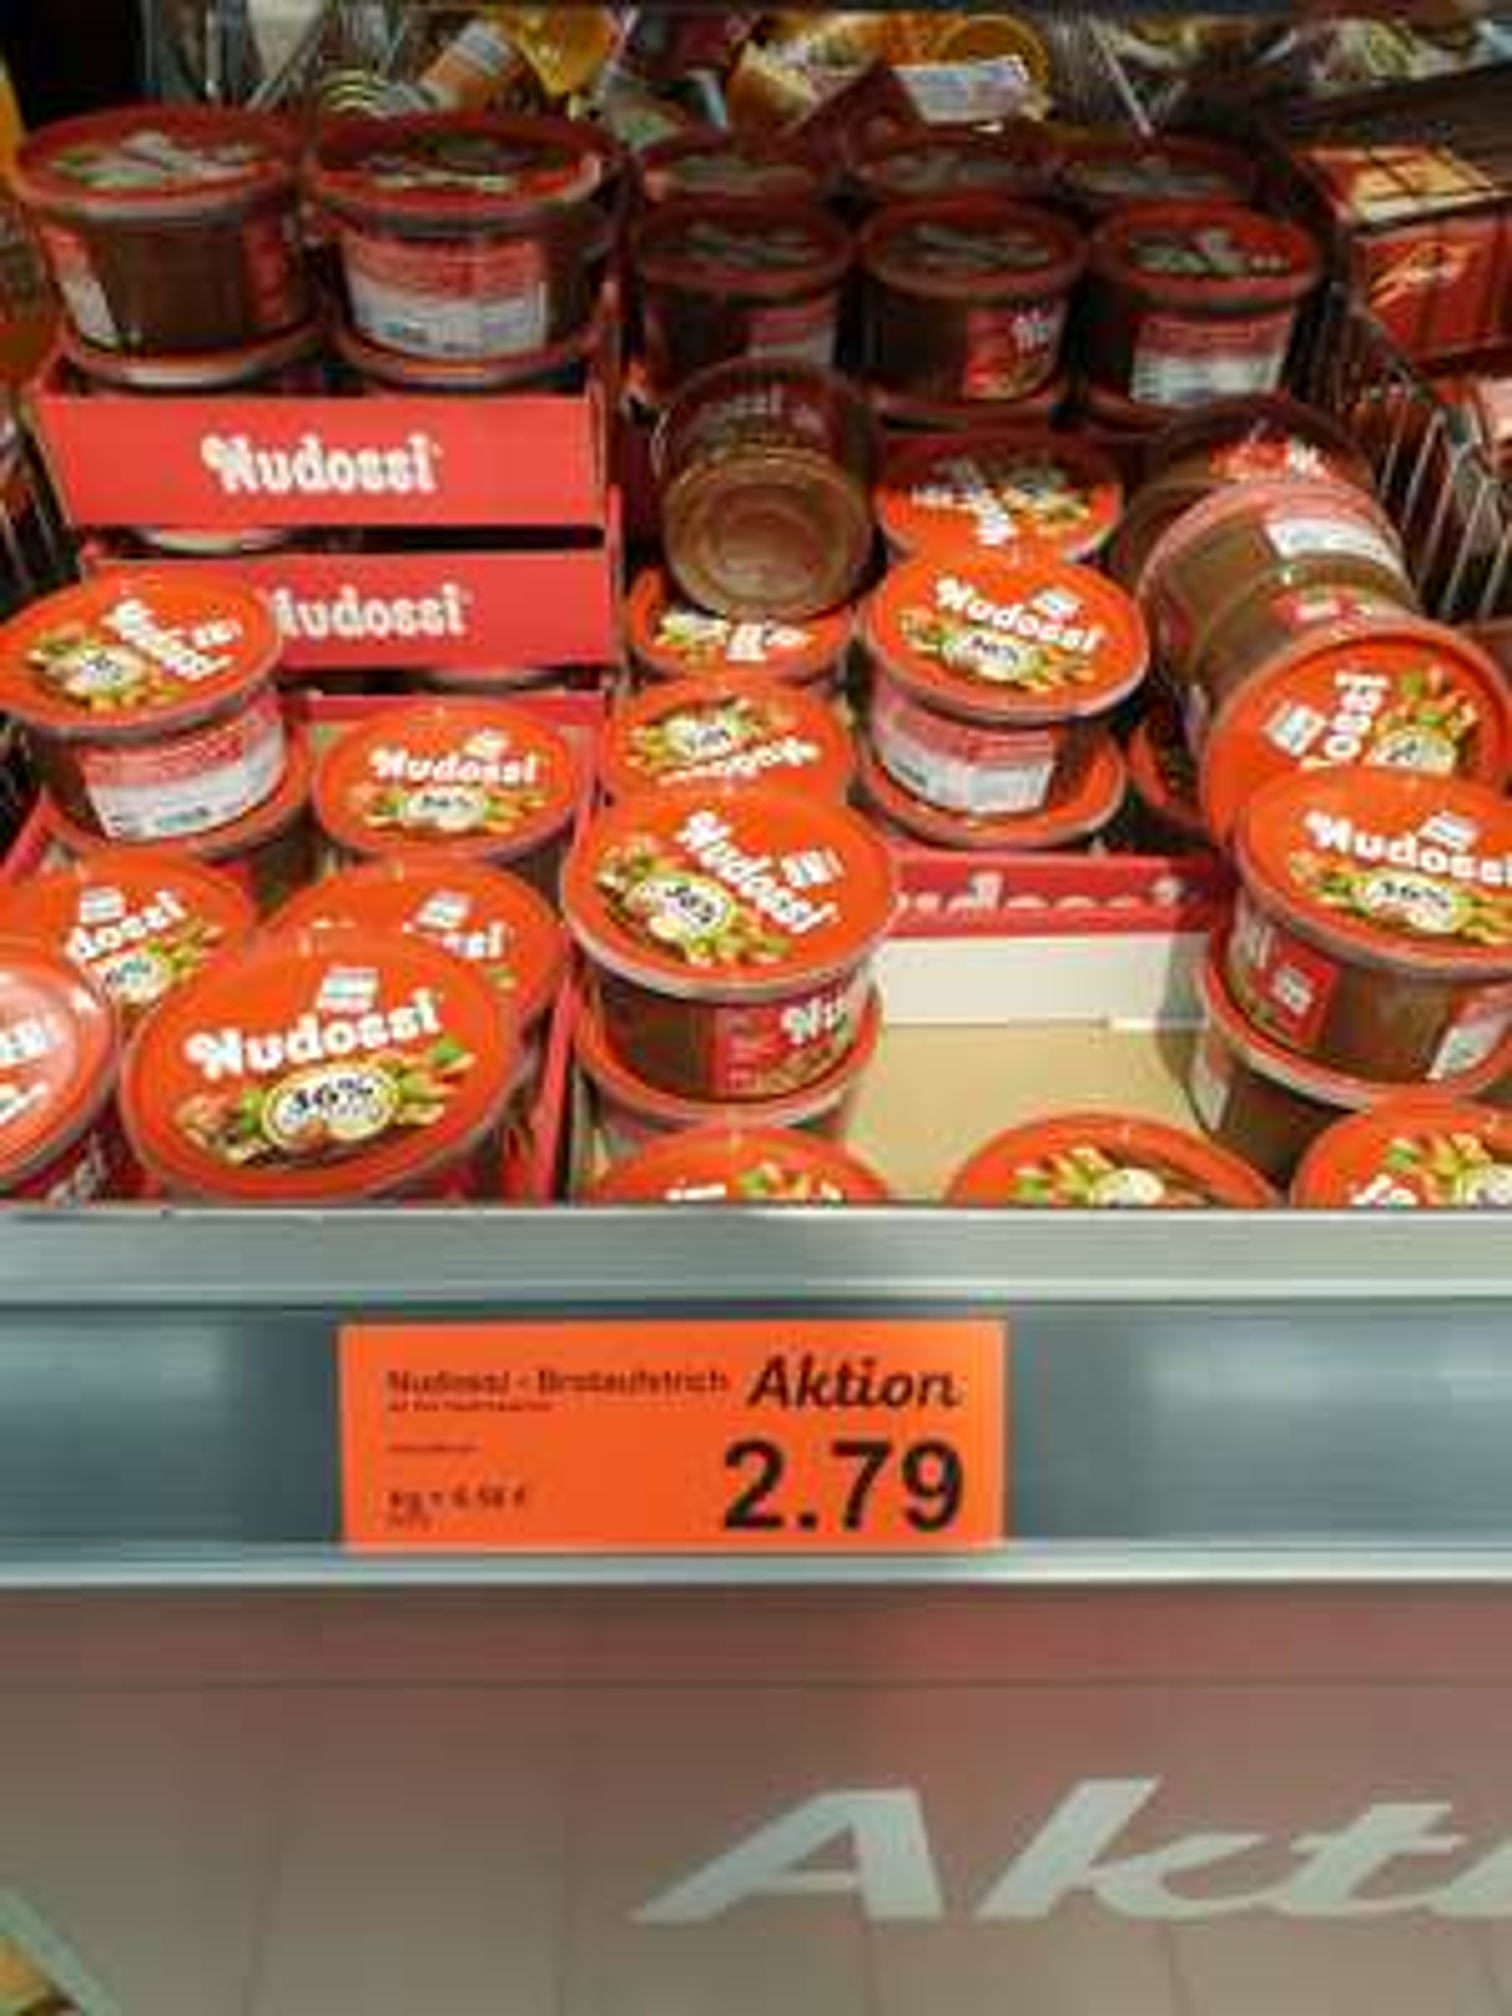 [Lokal Berlin] Aldi Nord Nudossi 425 g für 2,79 €